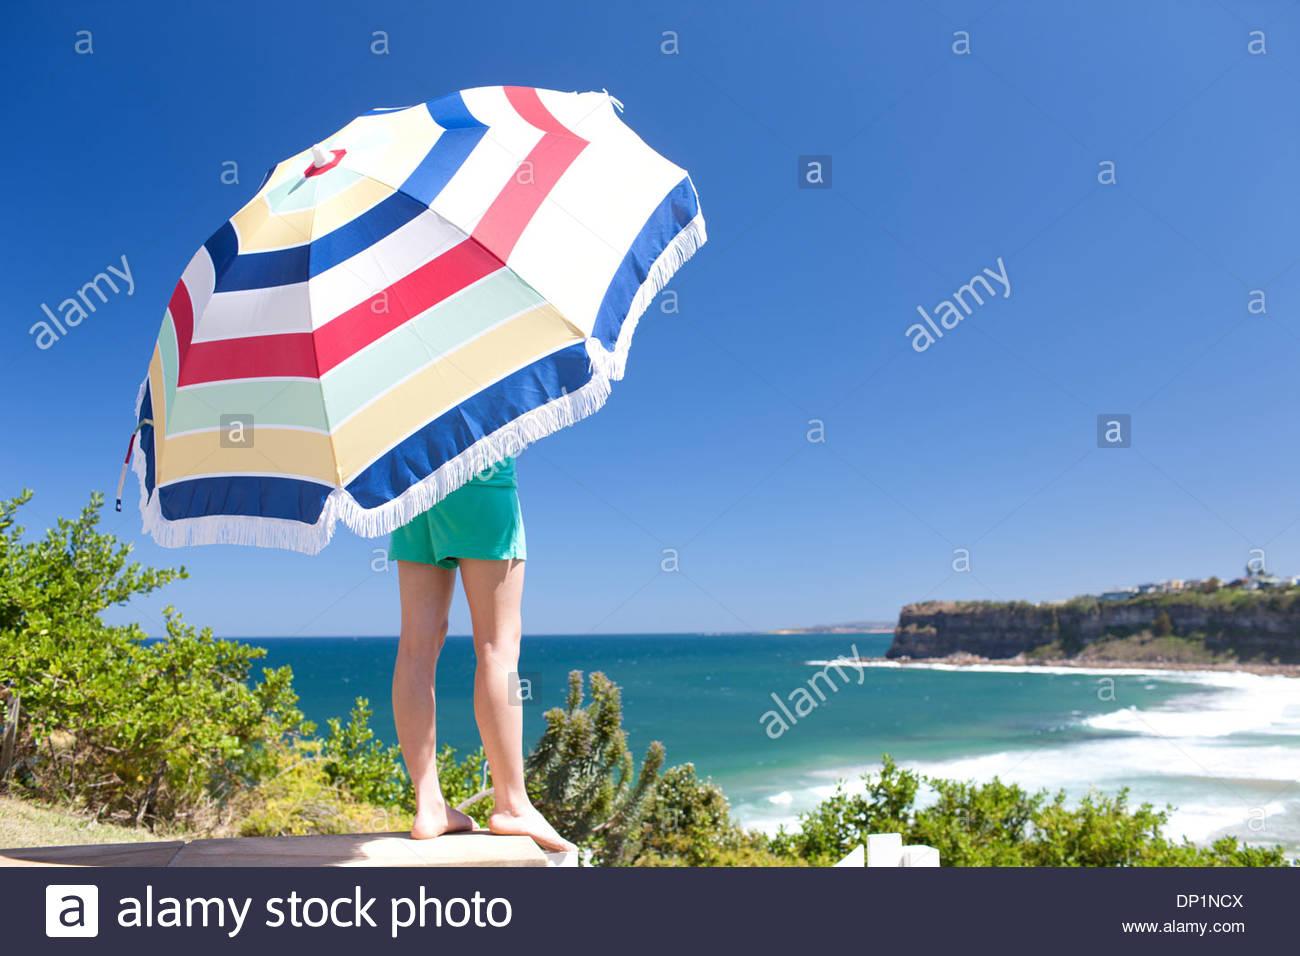 Woman in beach holding umbrella - Stock Image